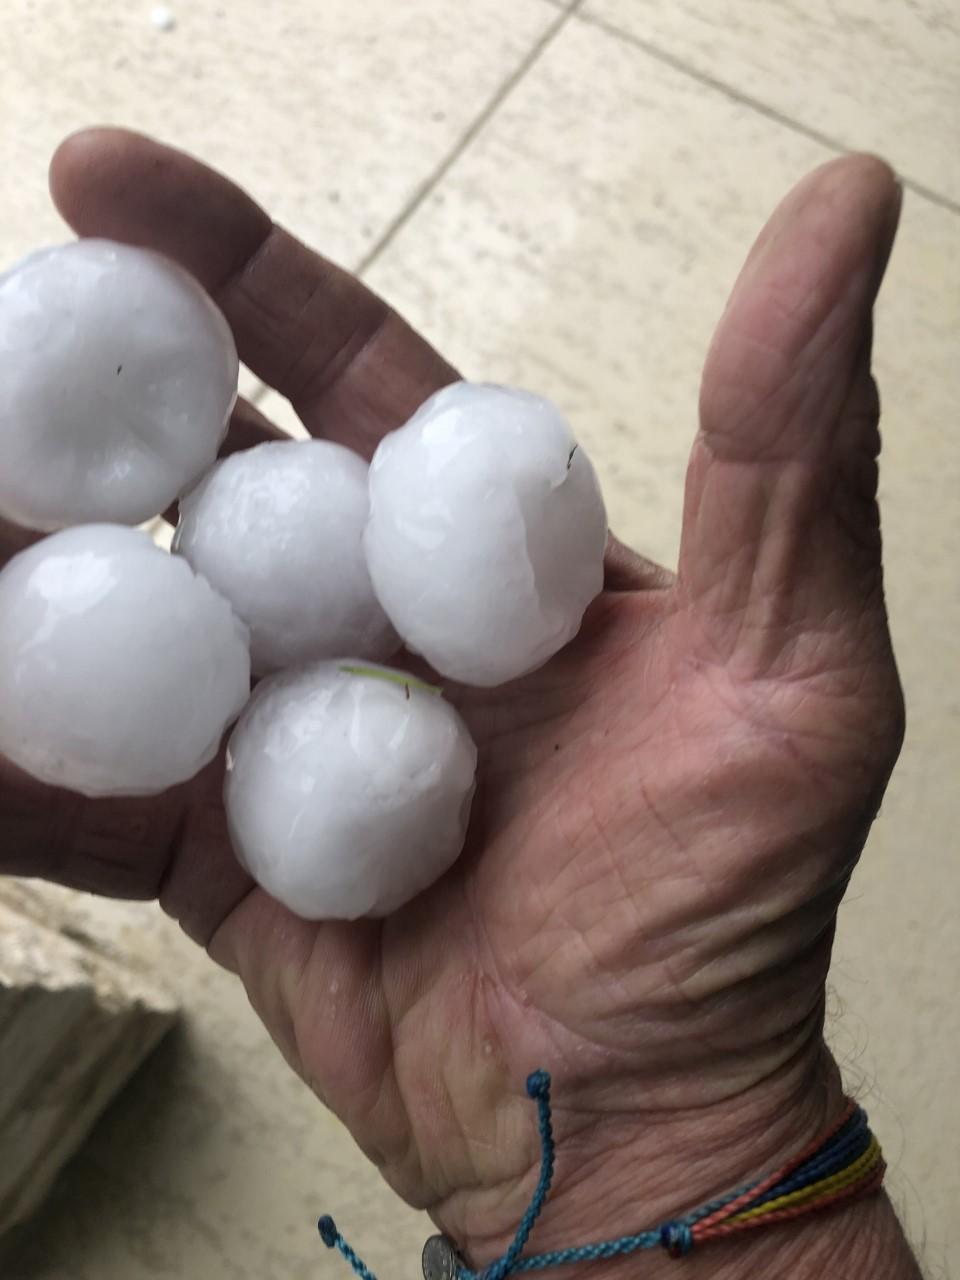 Hail in Leander April 15, 2021 - Mike Dickey